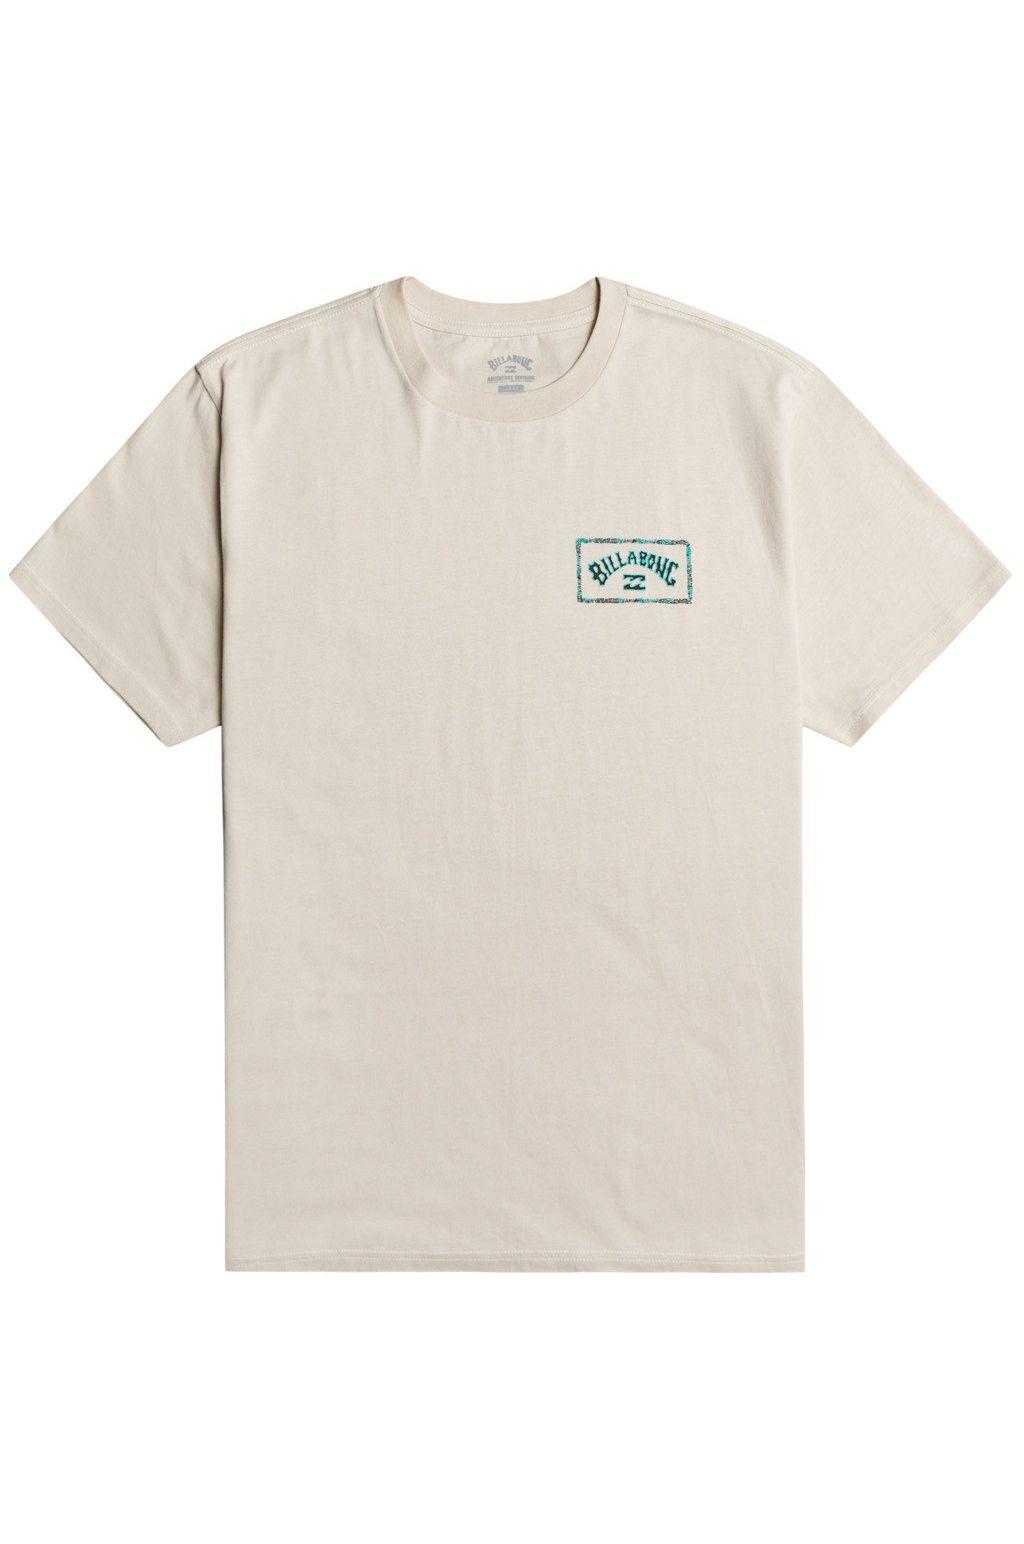 T-Shirt Billabong ARCH ADIV SS ADVENTURE DIVISION Moon